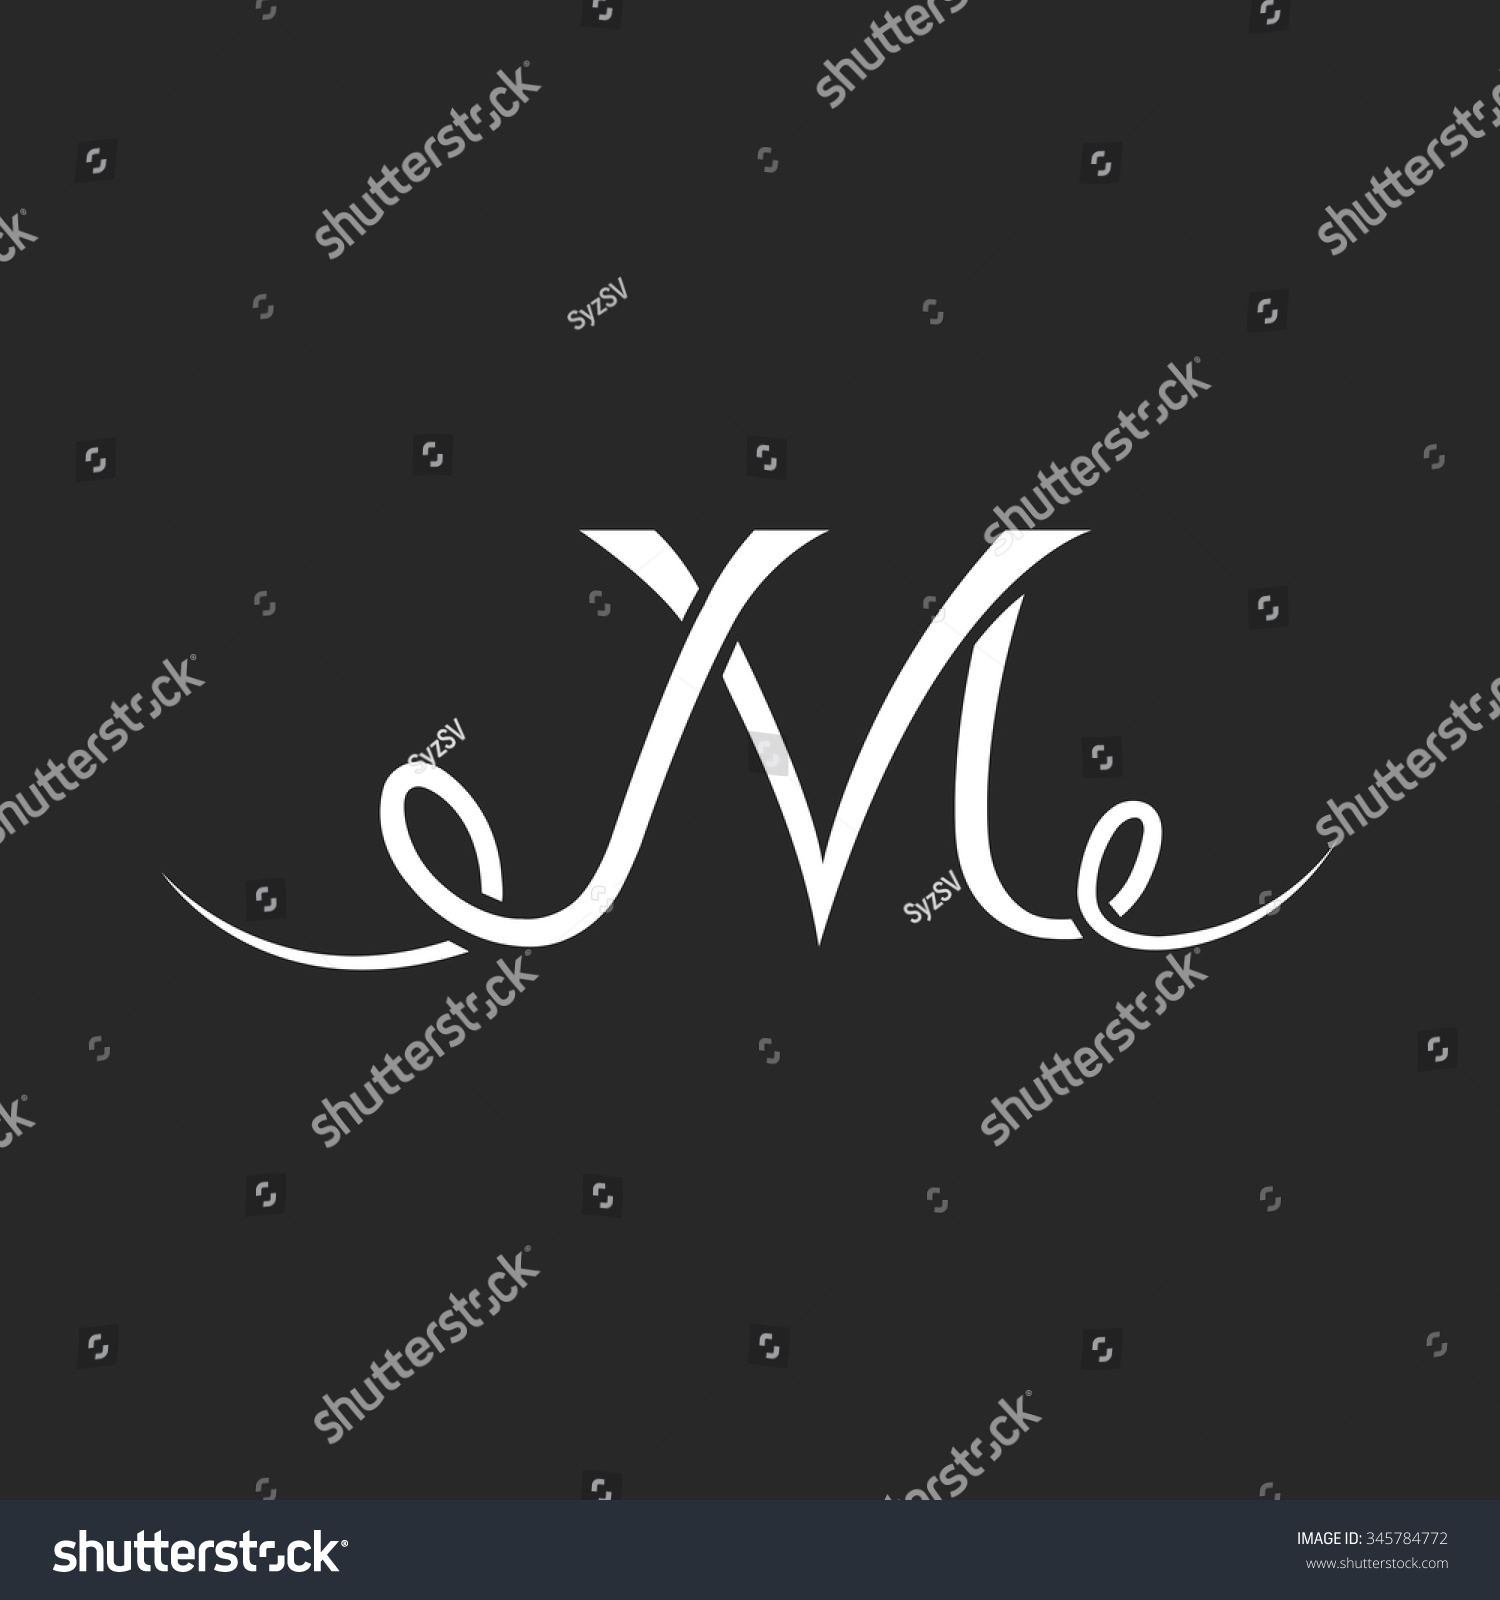 monogram tattoo m letter logo hand drawn thin line overlapping mockup calligraphic tattoo design